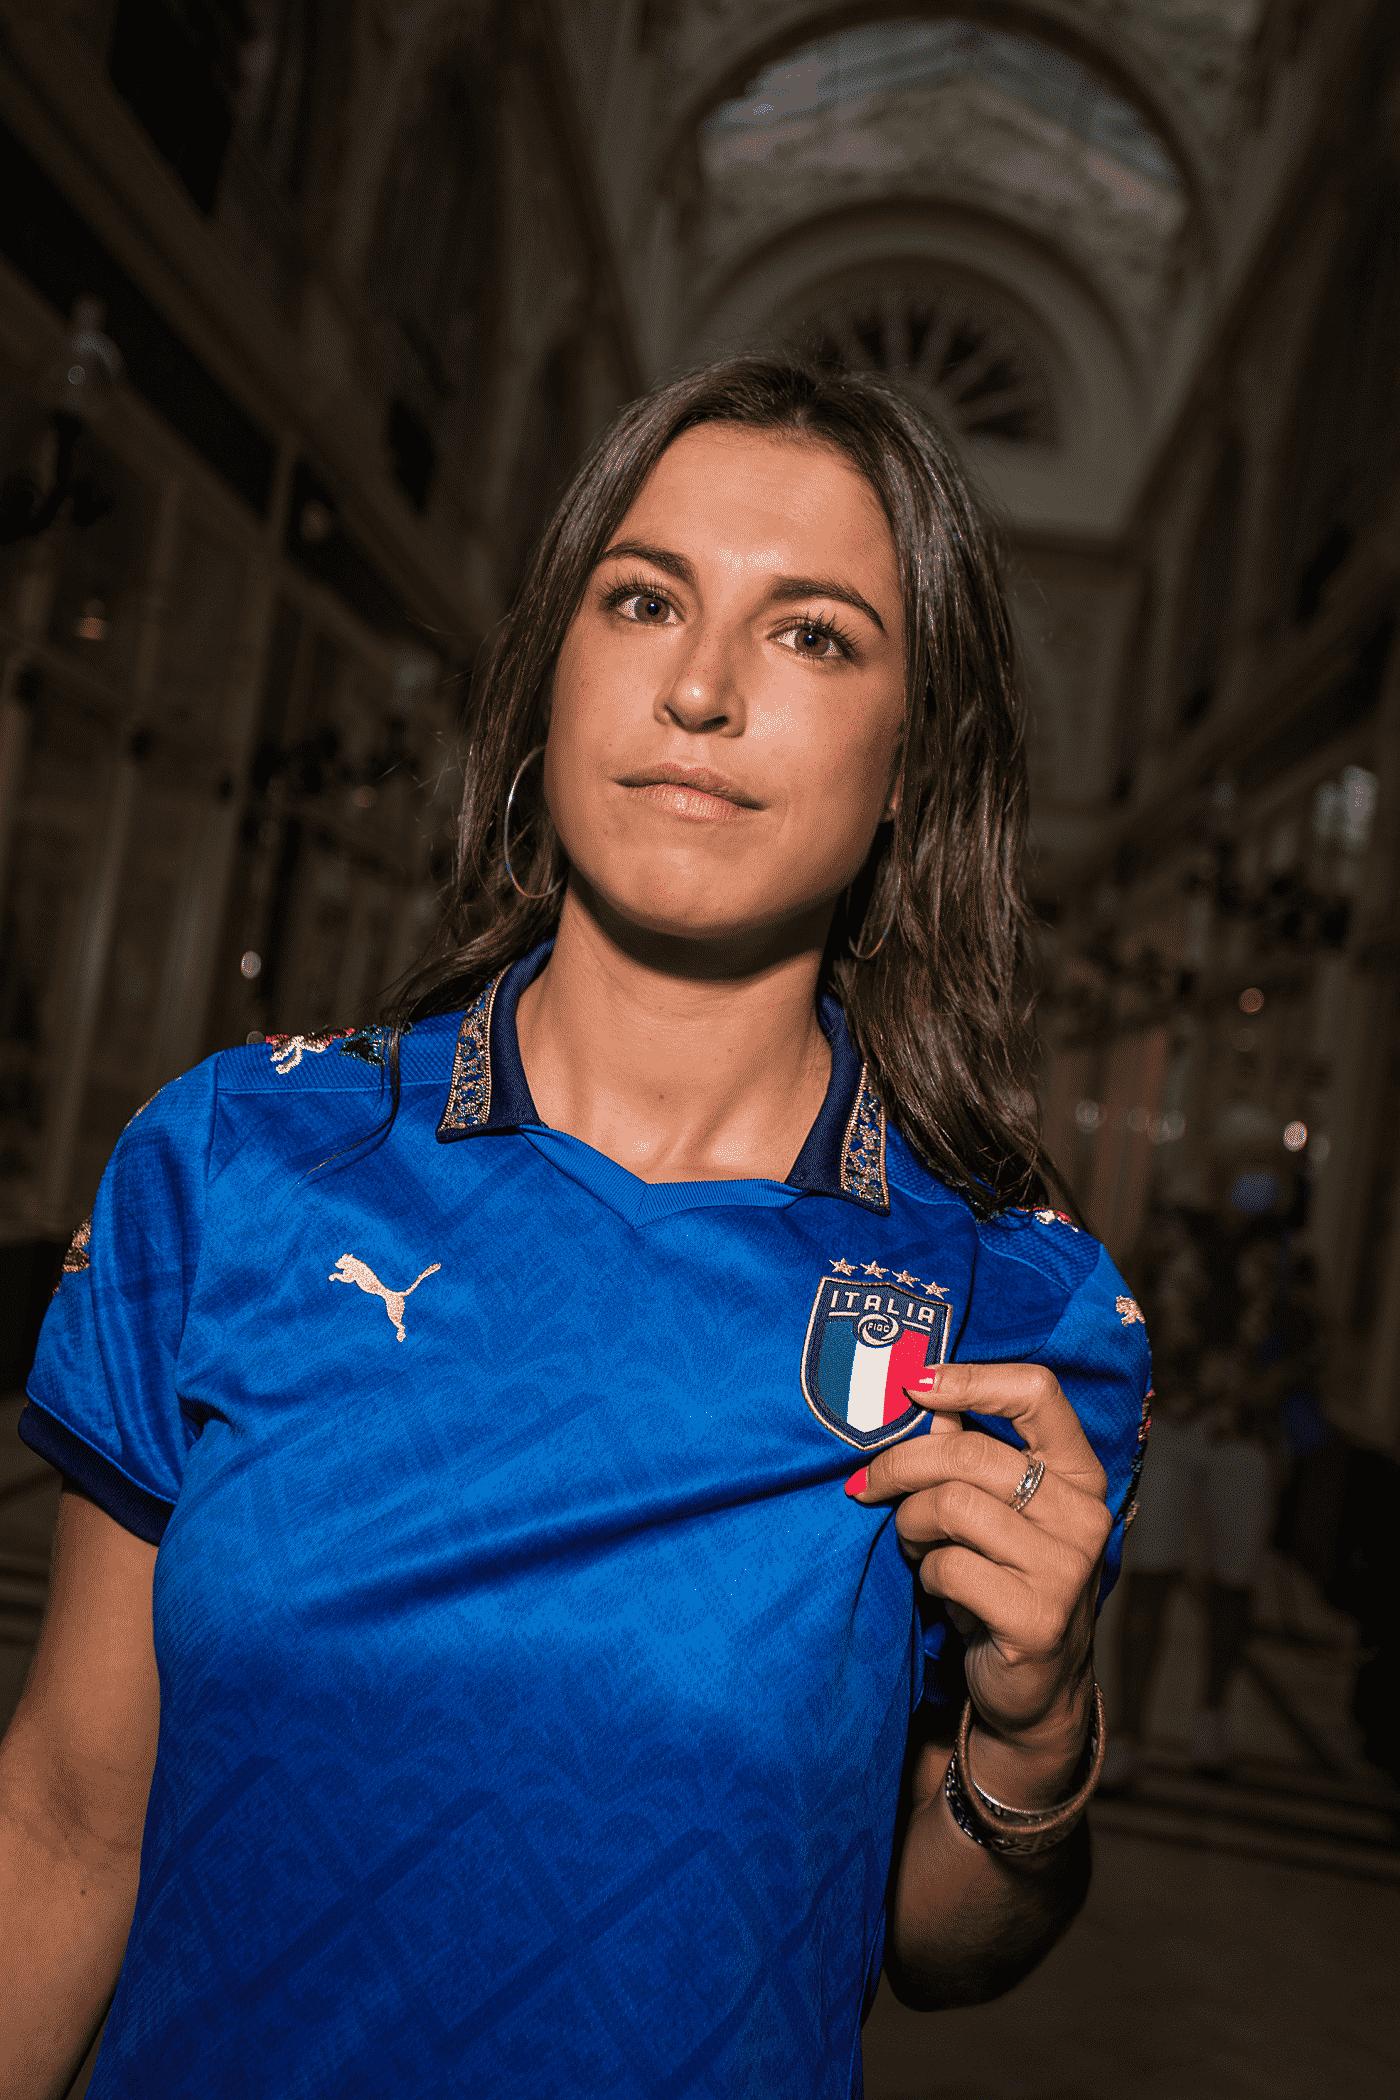 maillot-italie-the-football-gal-puma-footpack-21